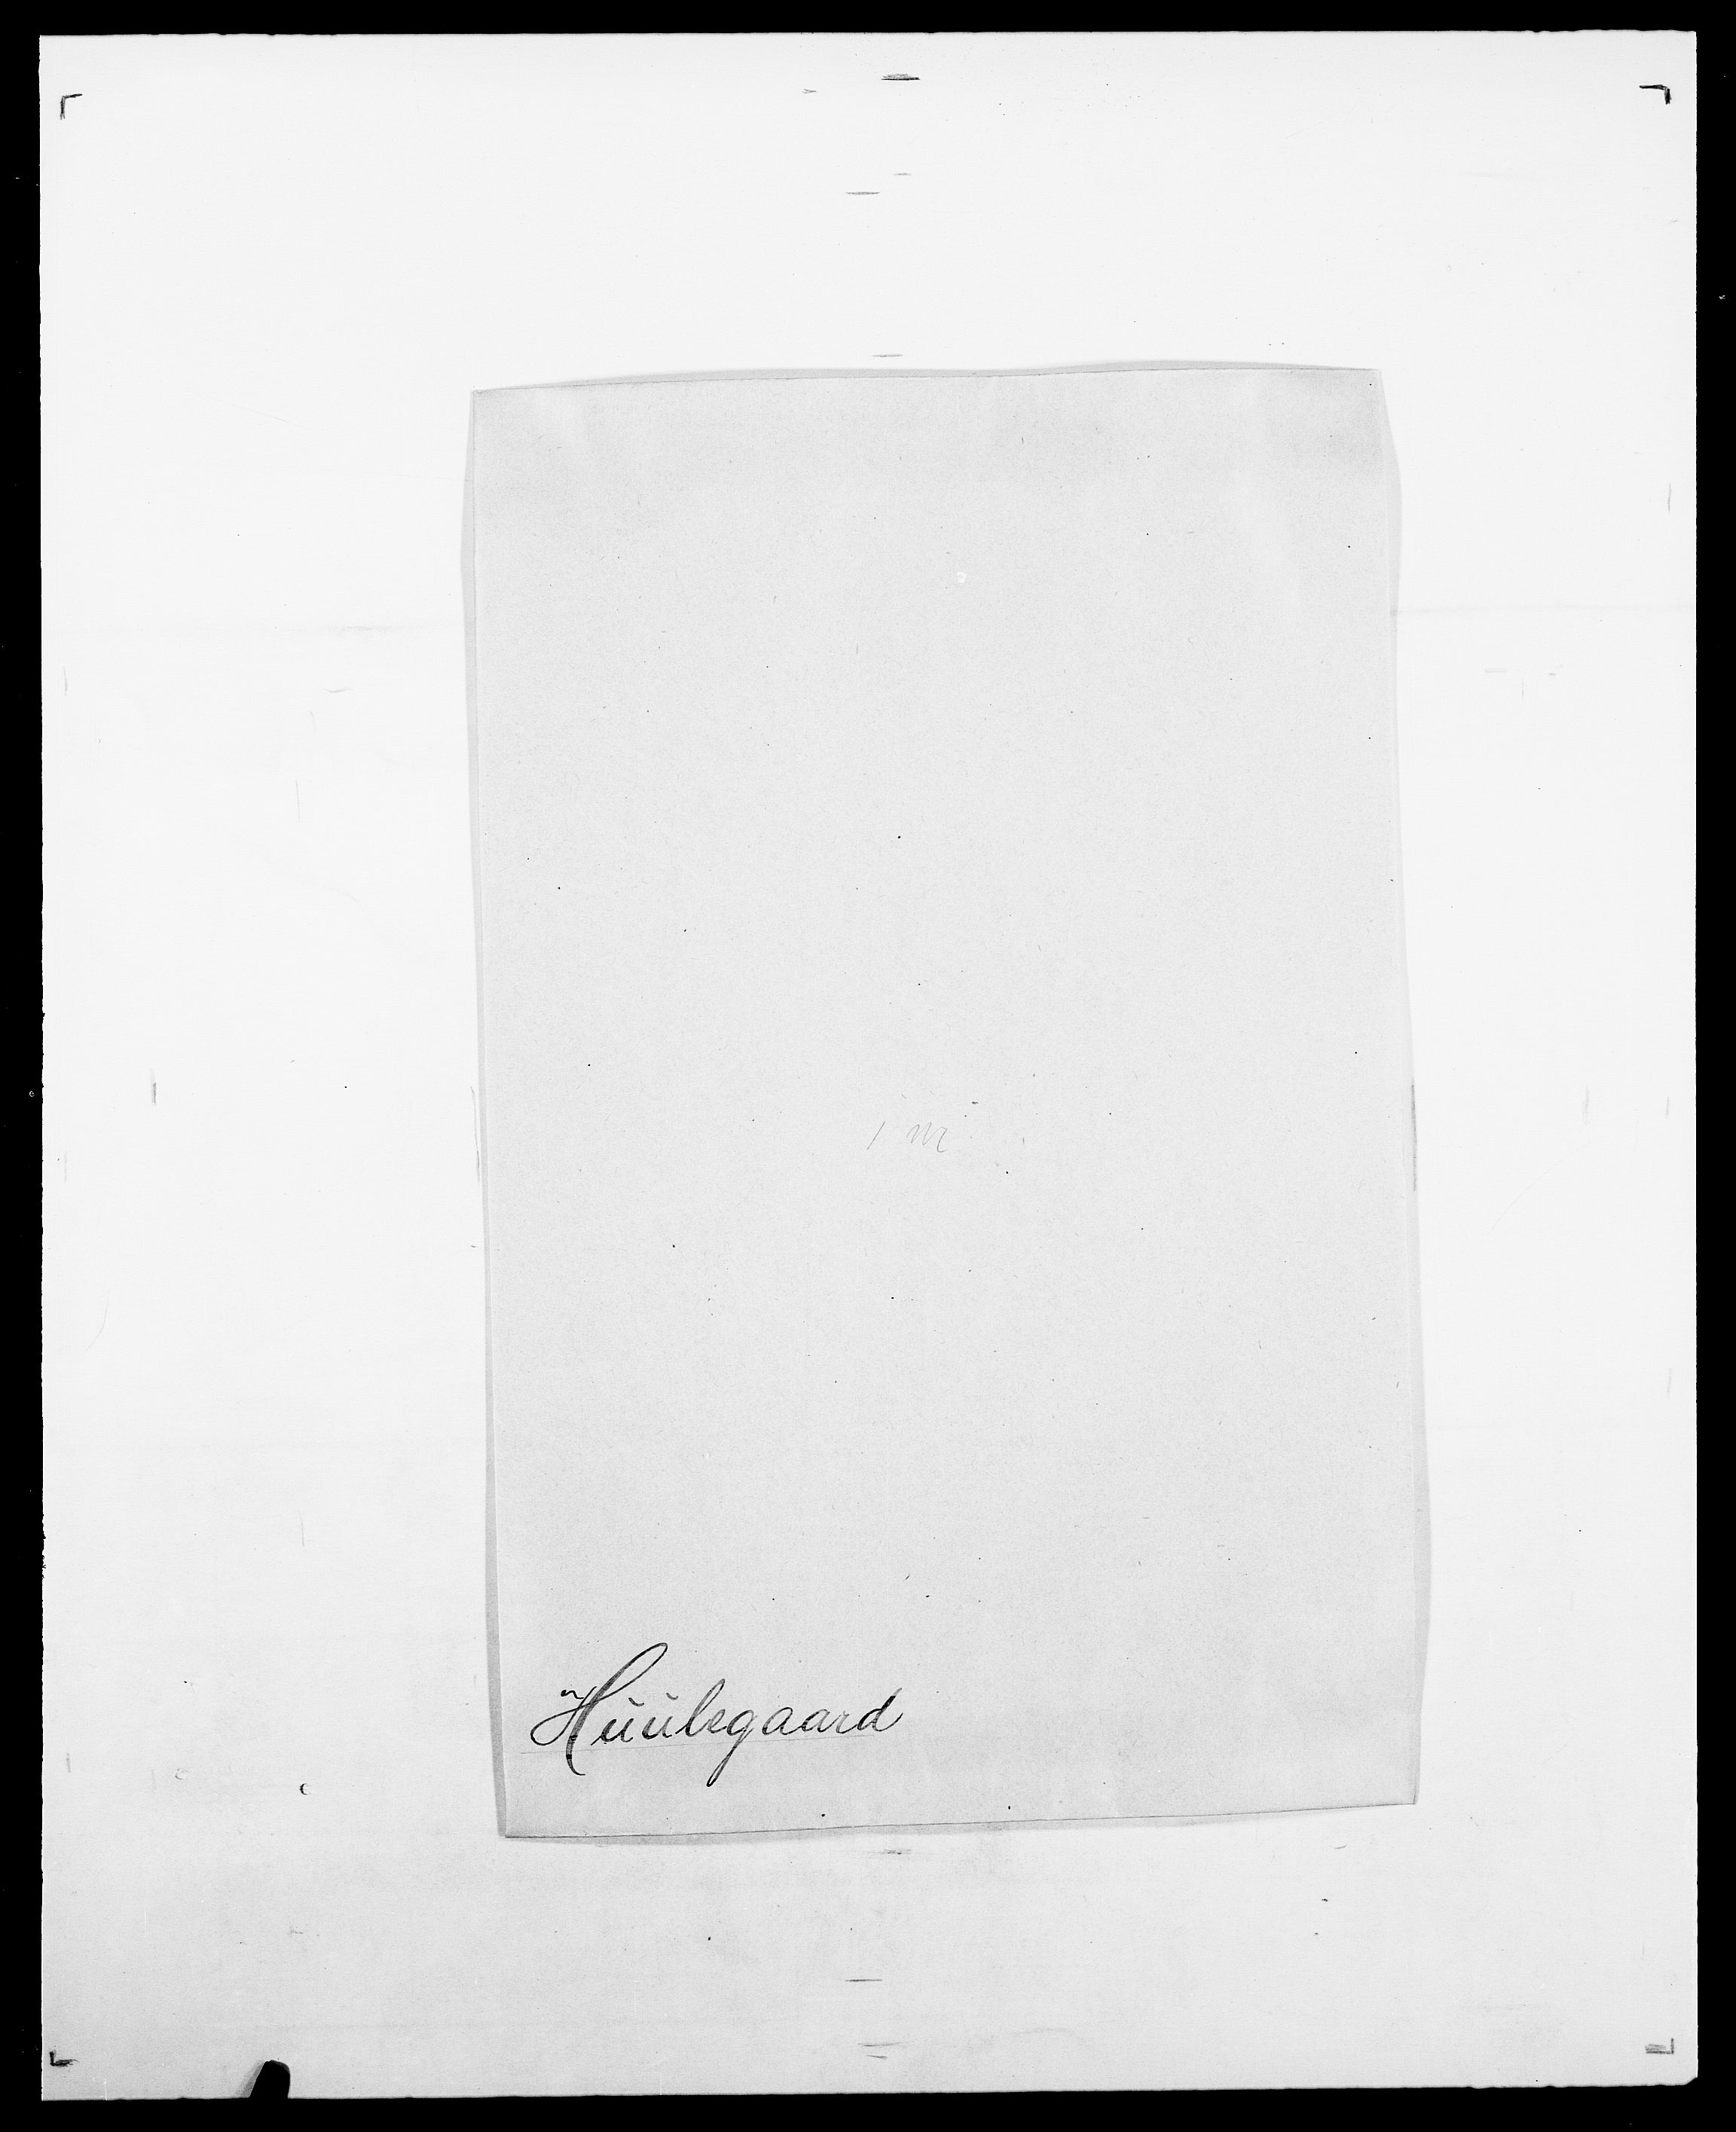 SAO, Delgobe, Charles Antoine - samling, D/Da/L0019: van der Hude - Joys, s. 94